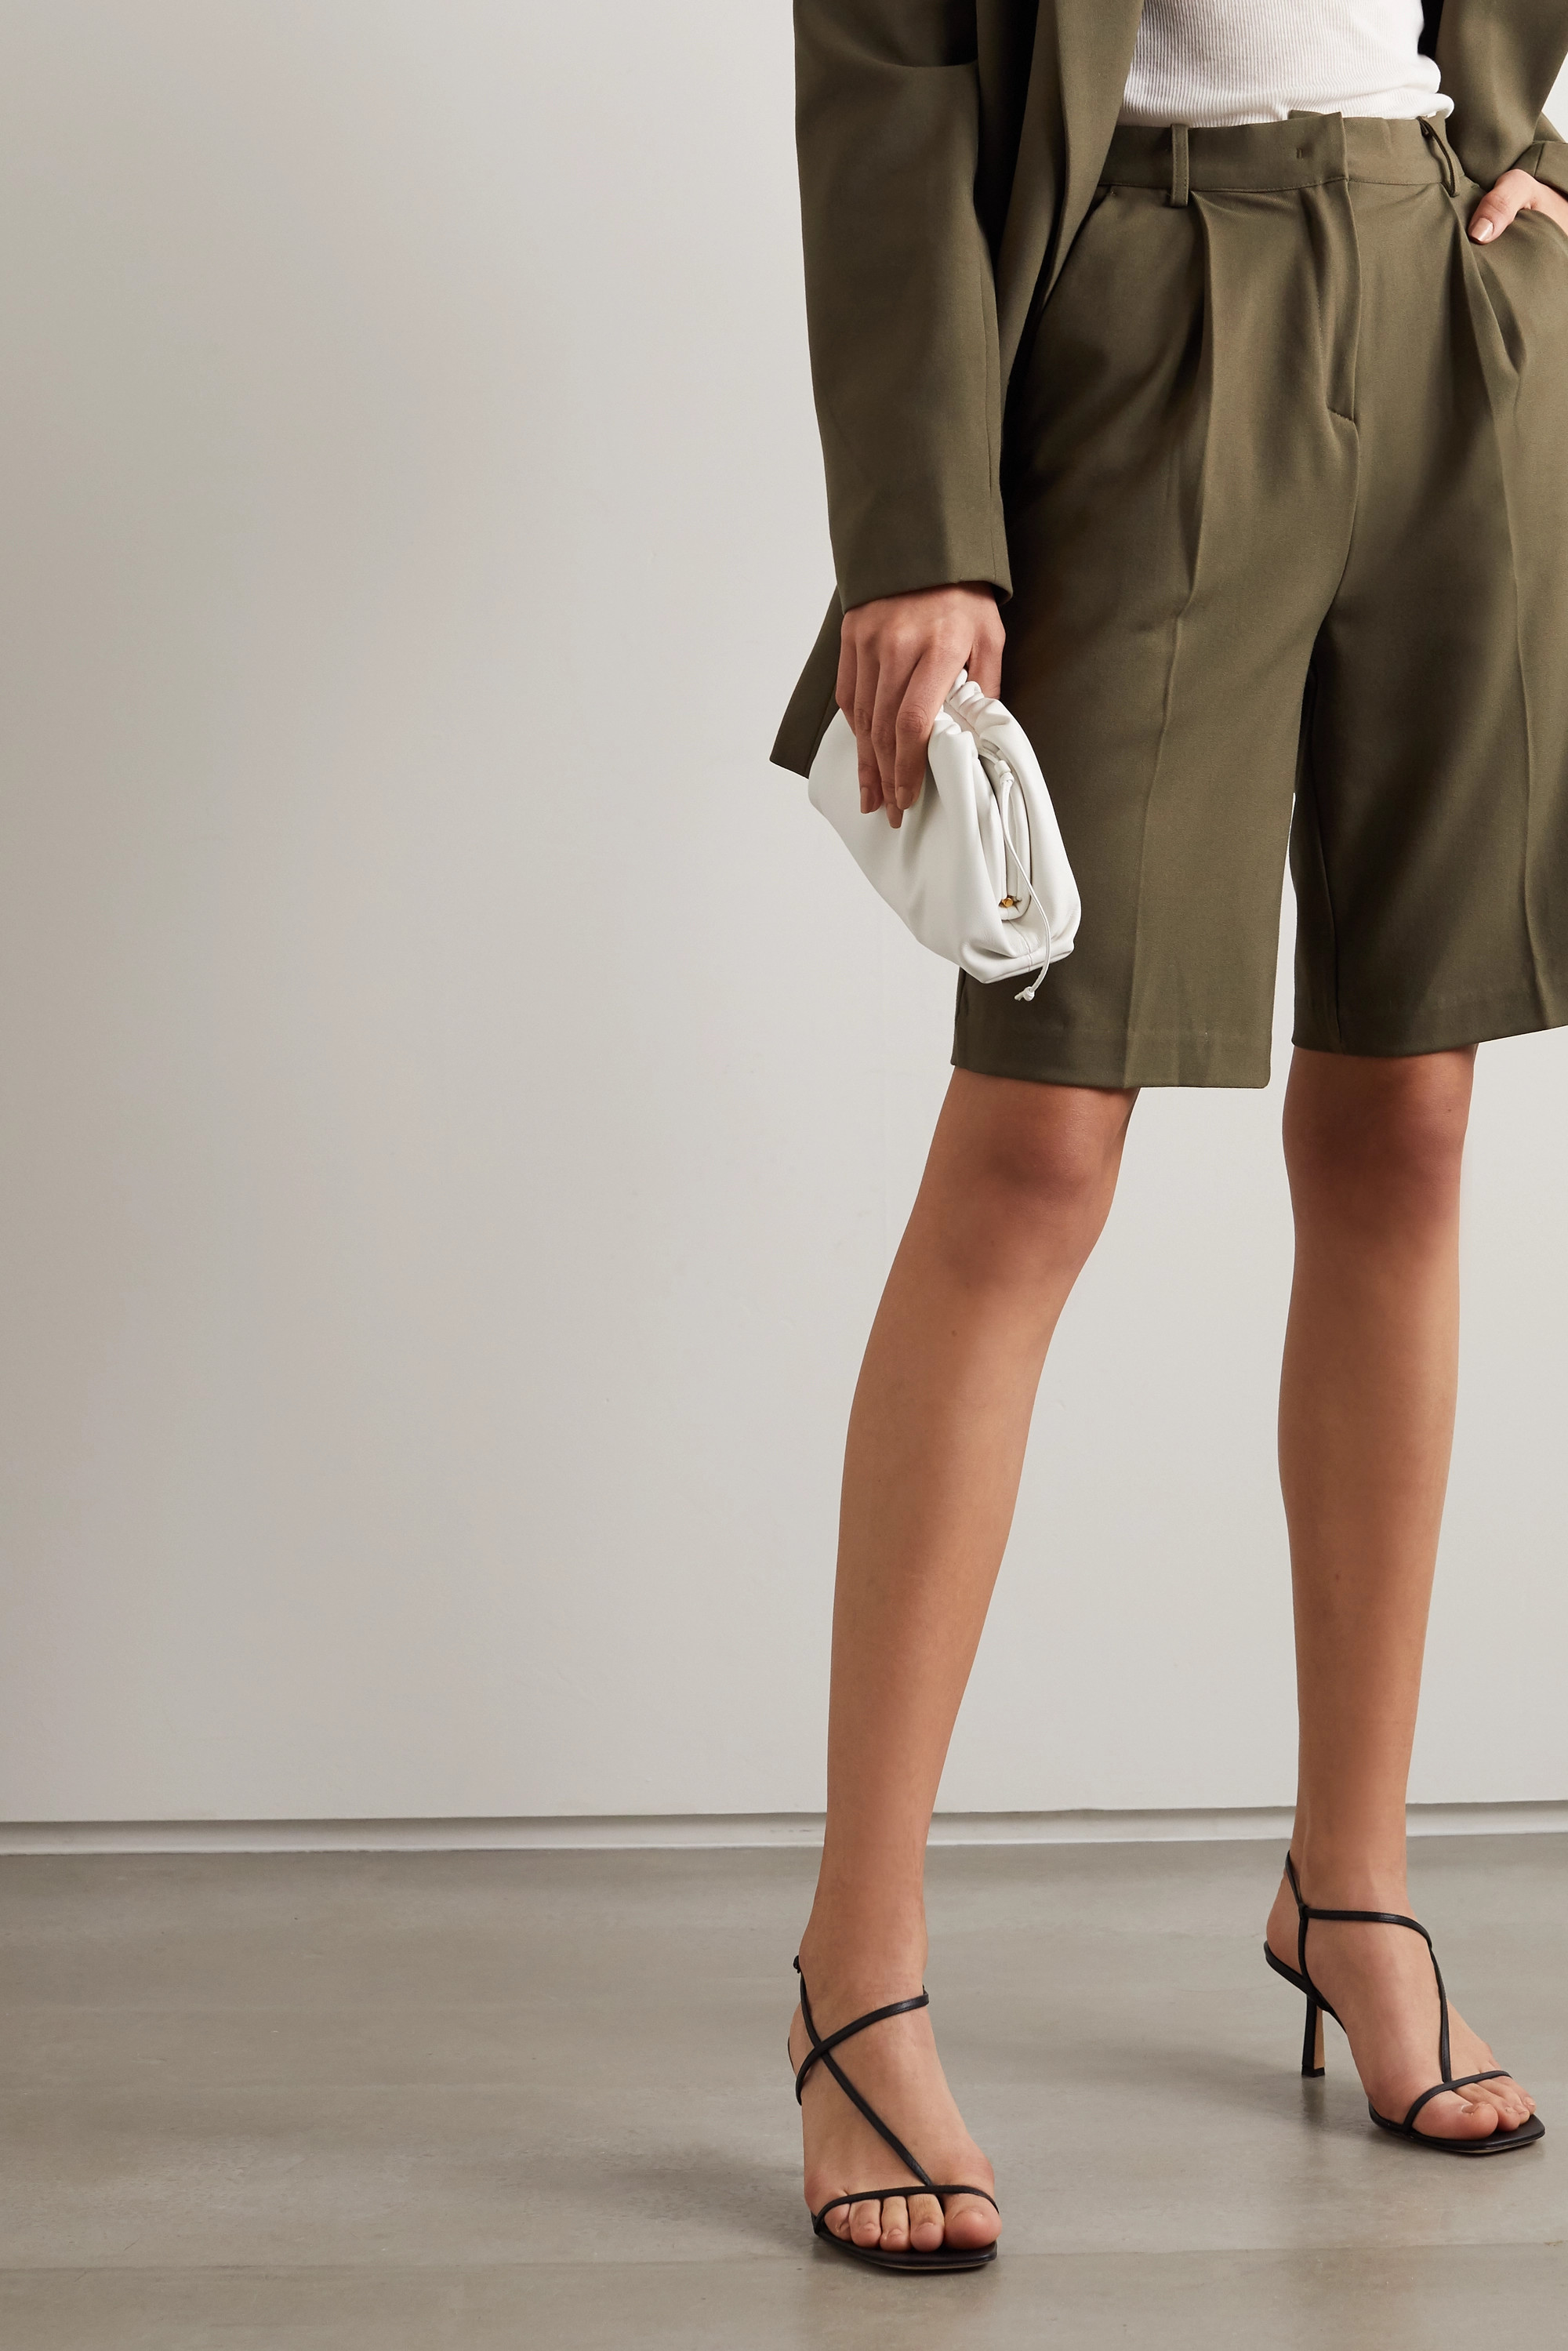 STUDIO AMELIA 2.5 leather sandals